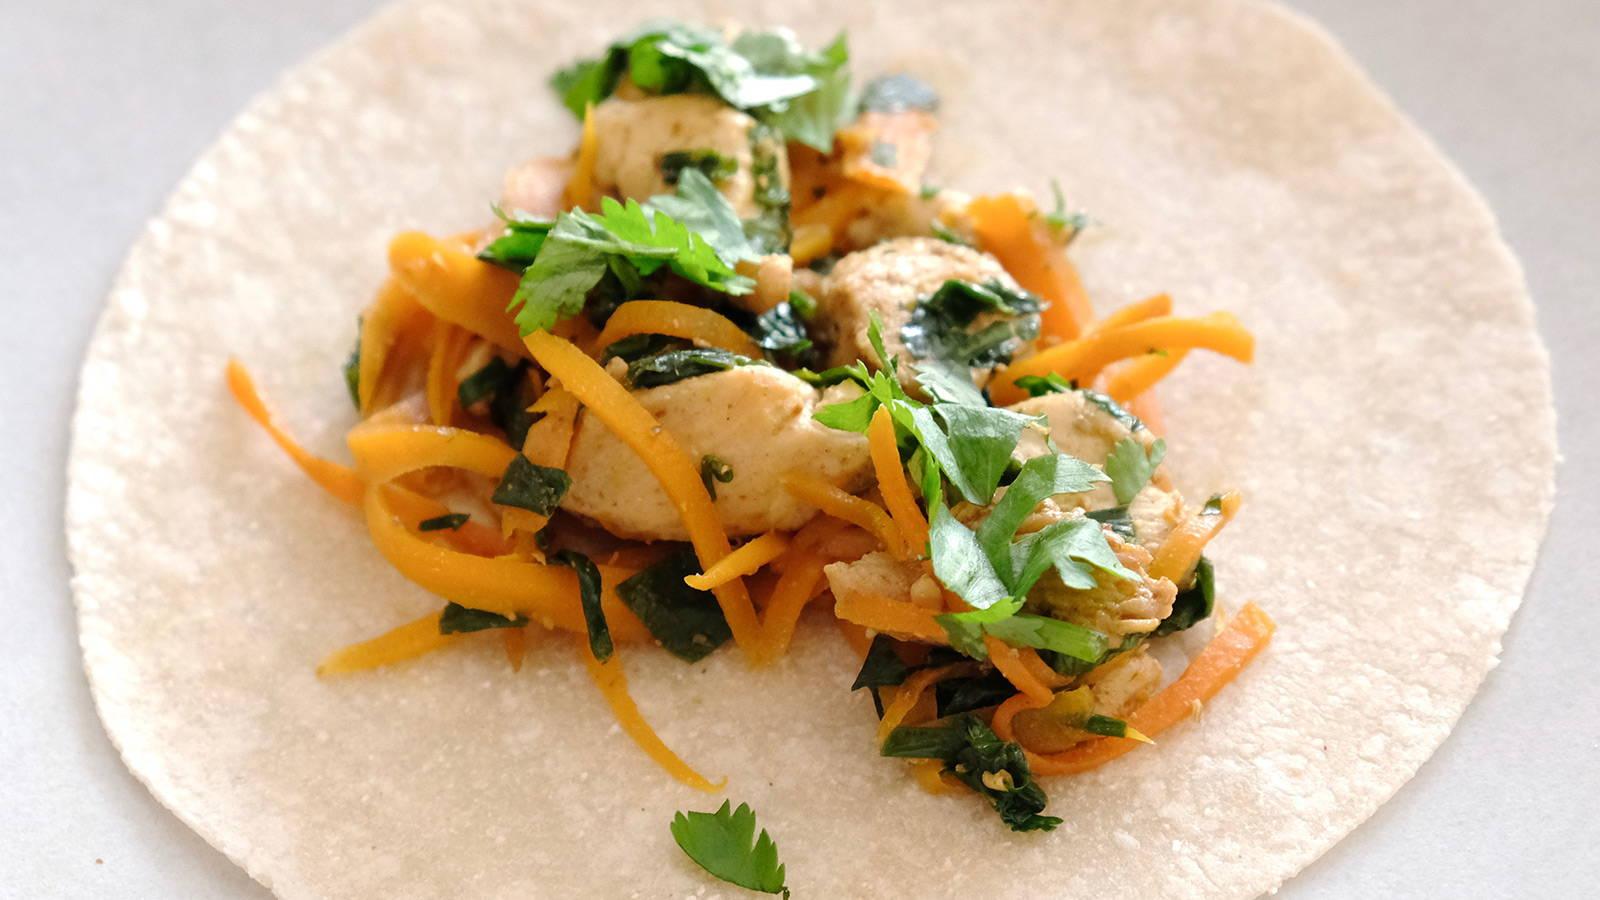 Indian-Spiced Low FODMAP Chicken Tortillas